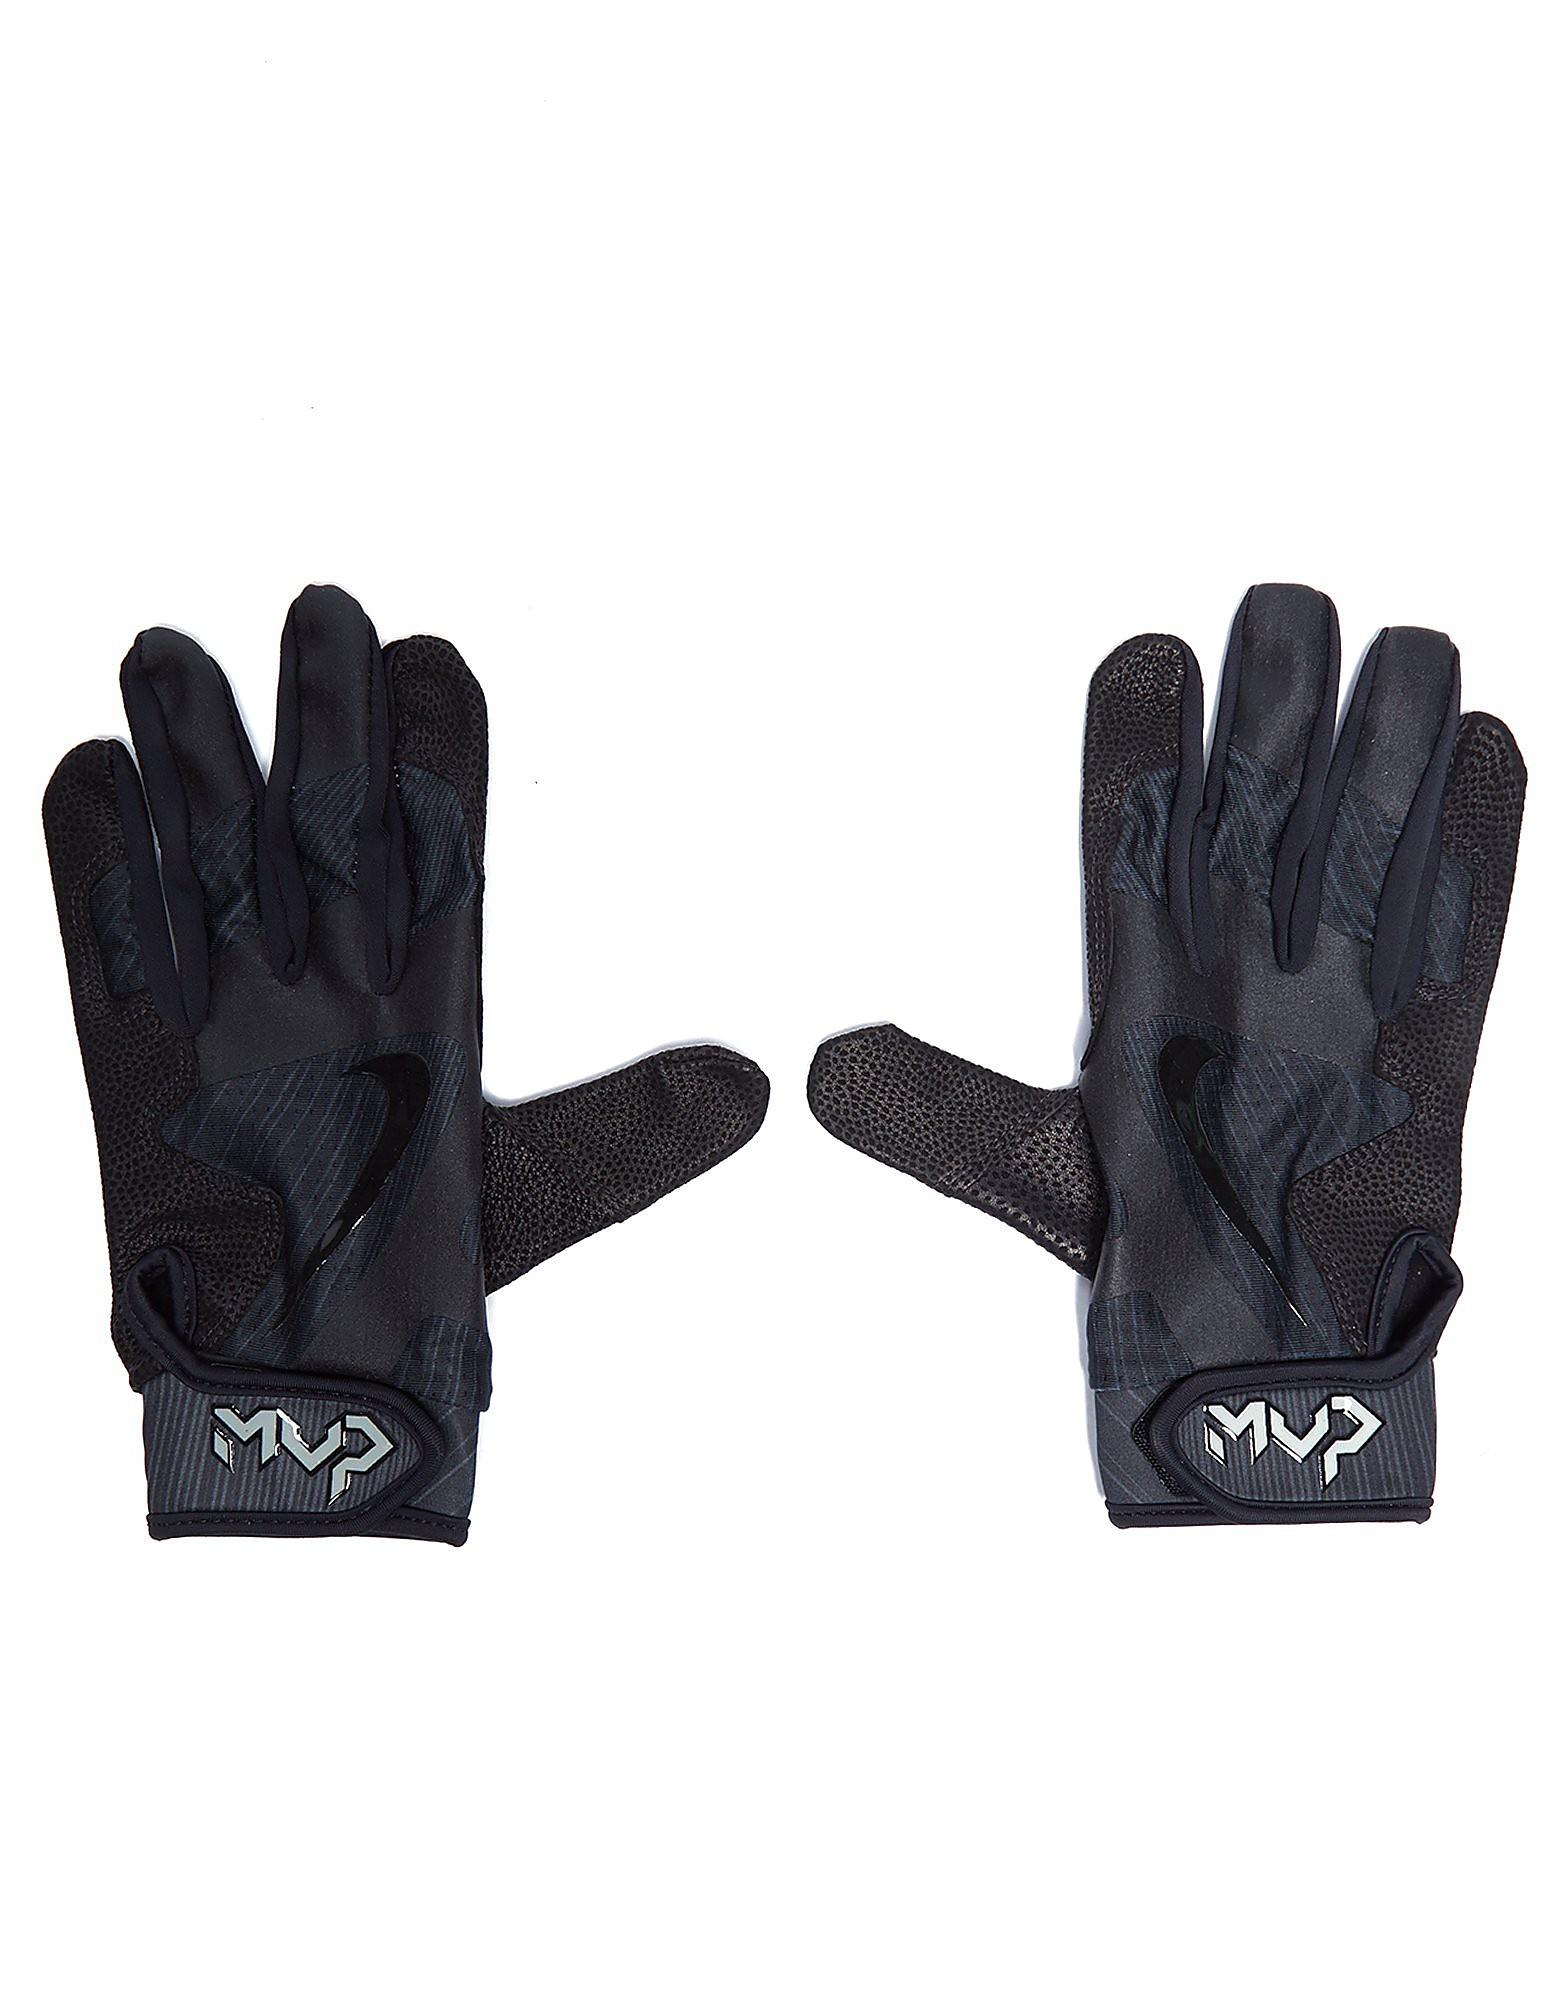 Nike MVP Pro Batting-handsker